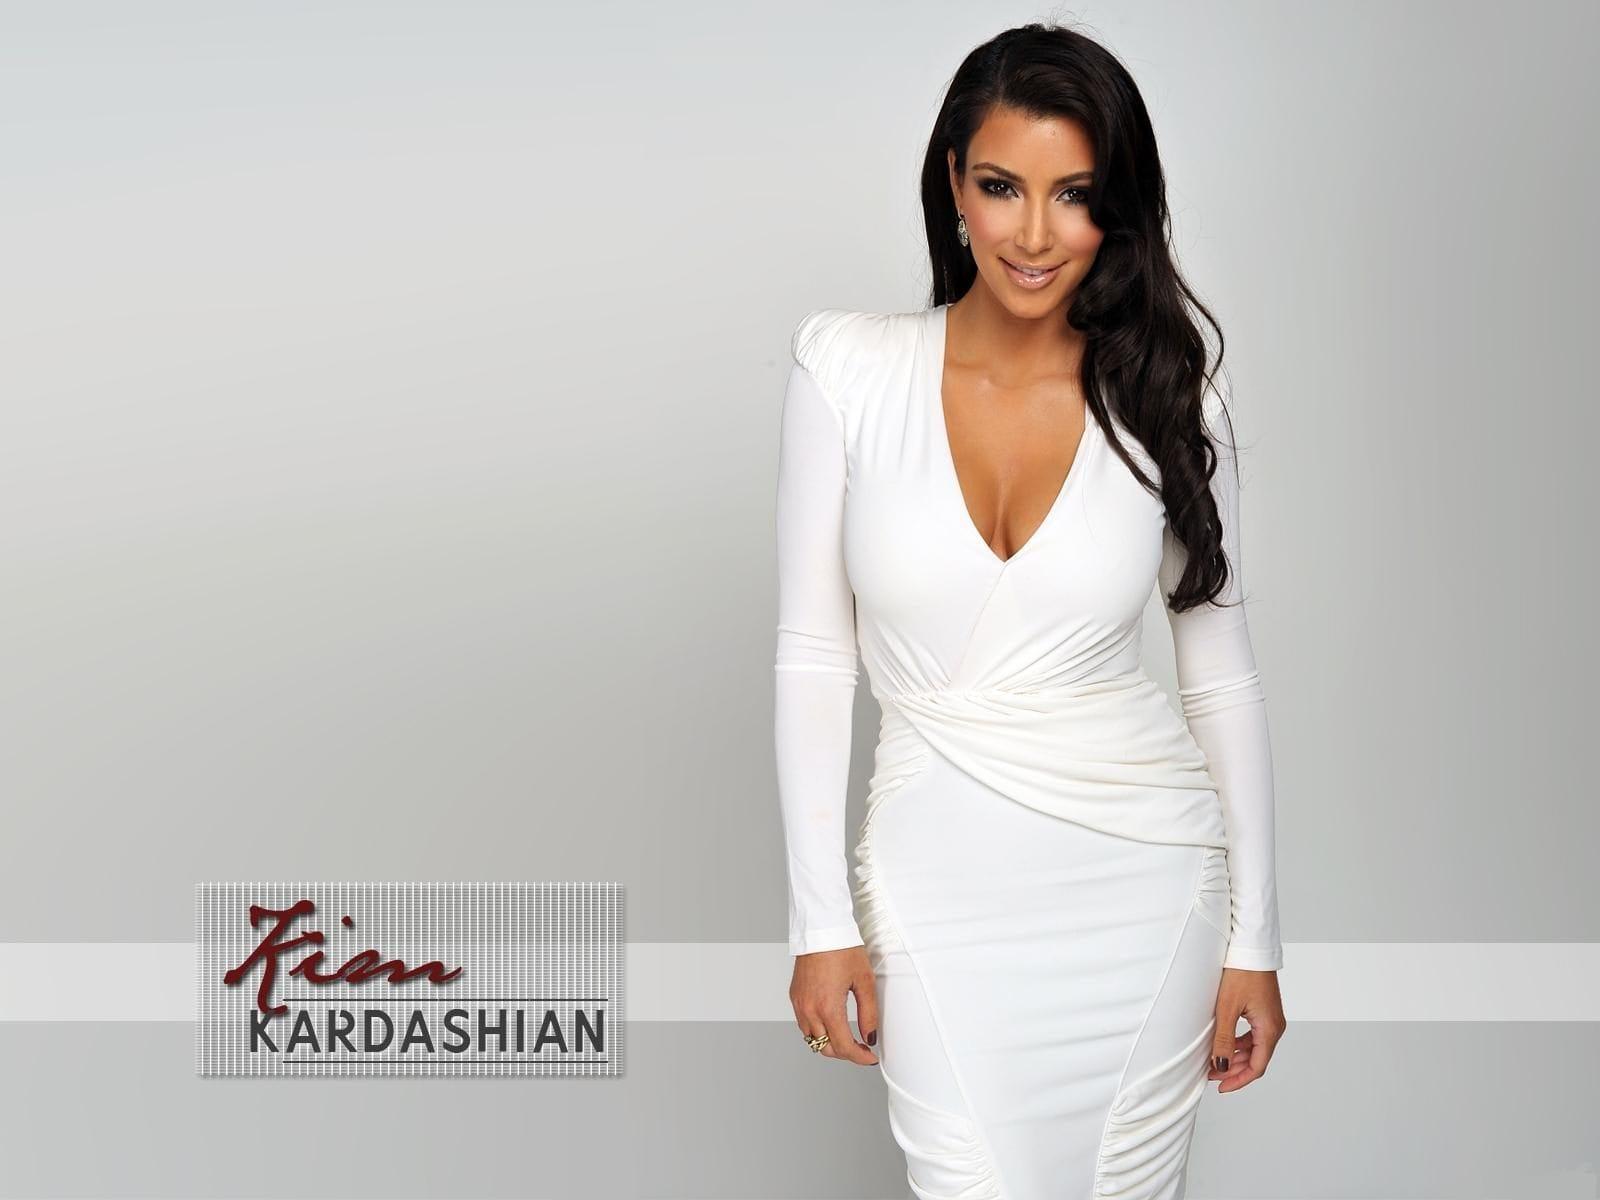 Kim Kardashian widescreen for desktop